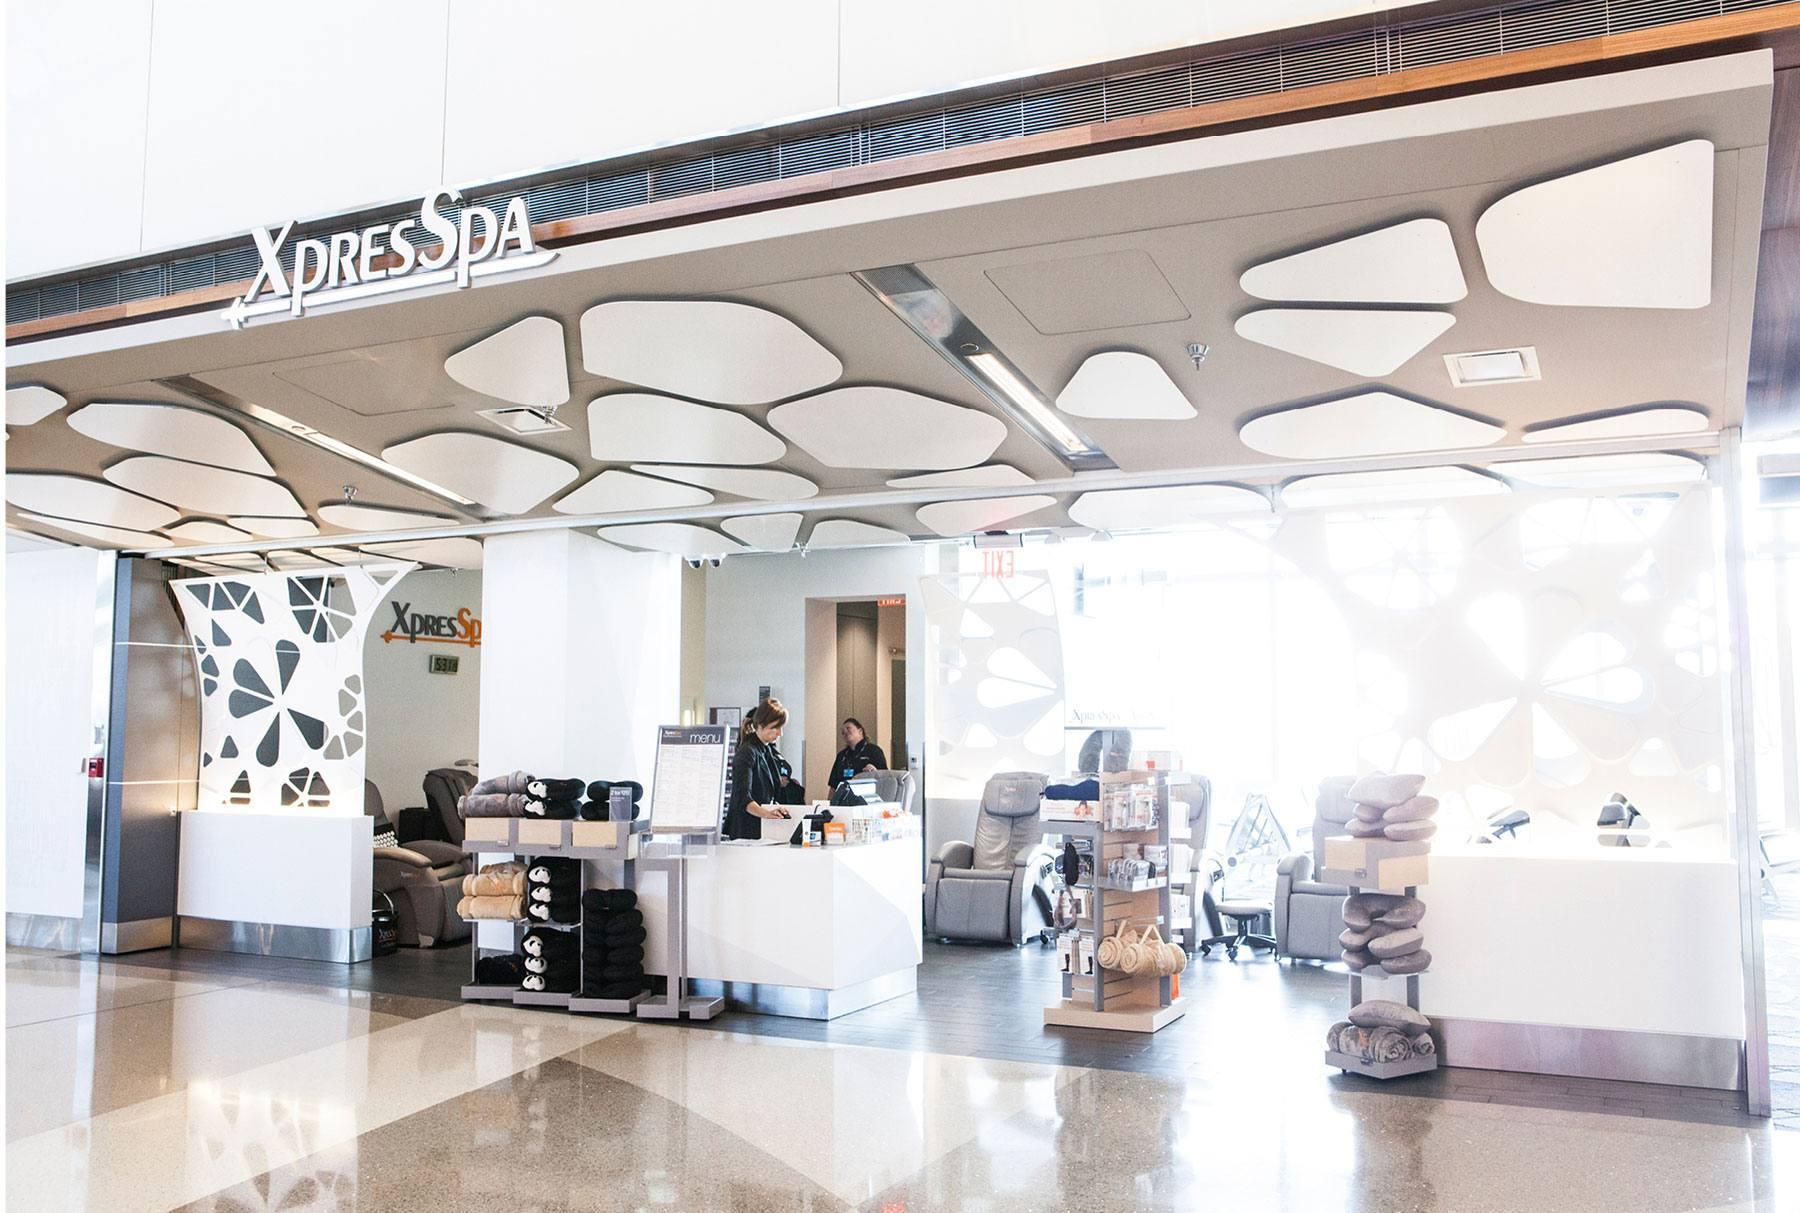 Tom Bradley国際ターミナルでオープンしたXpresSpa